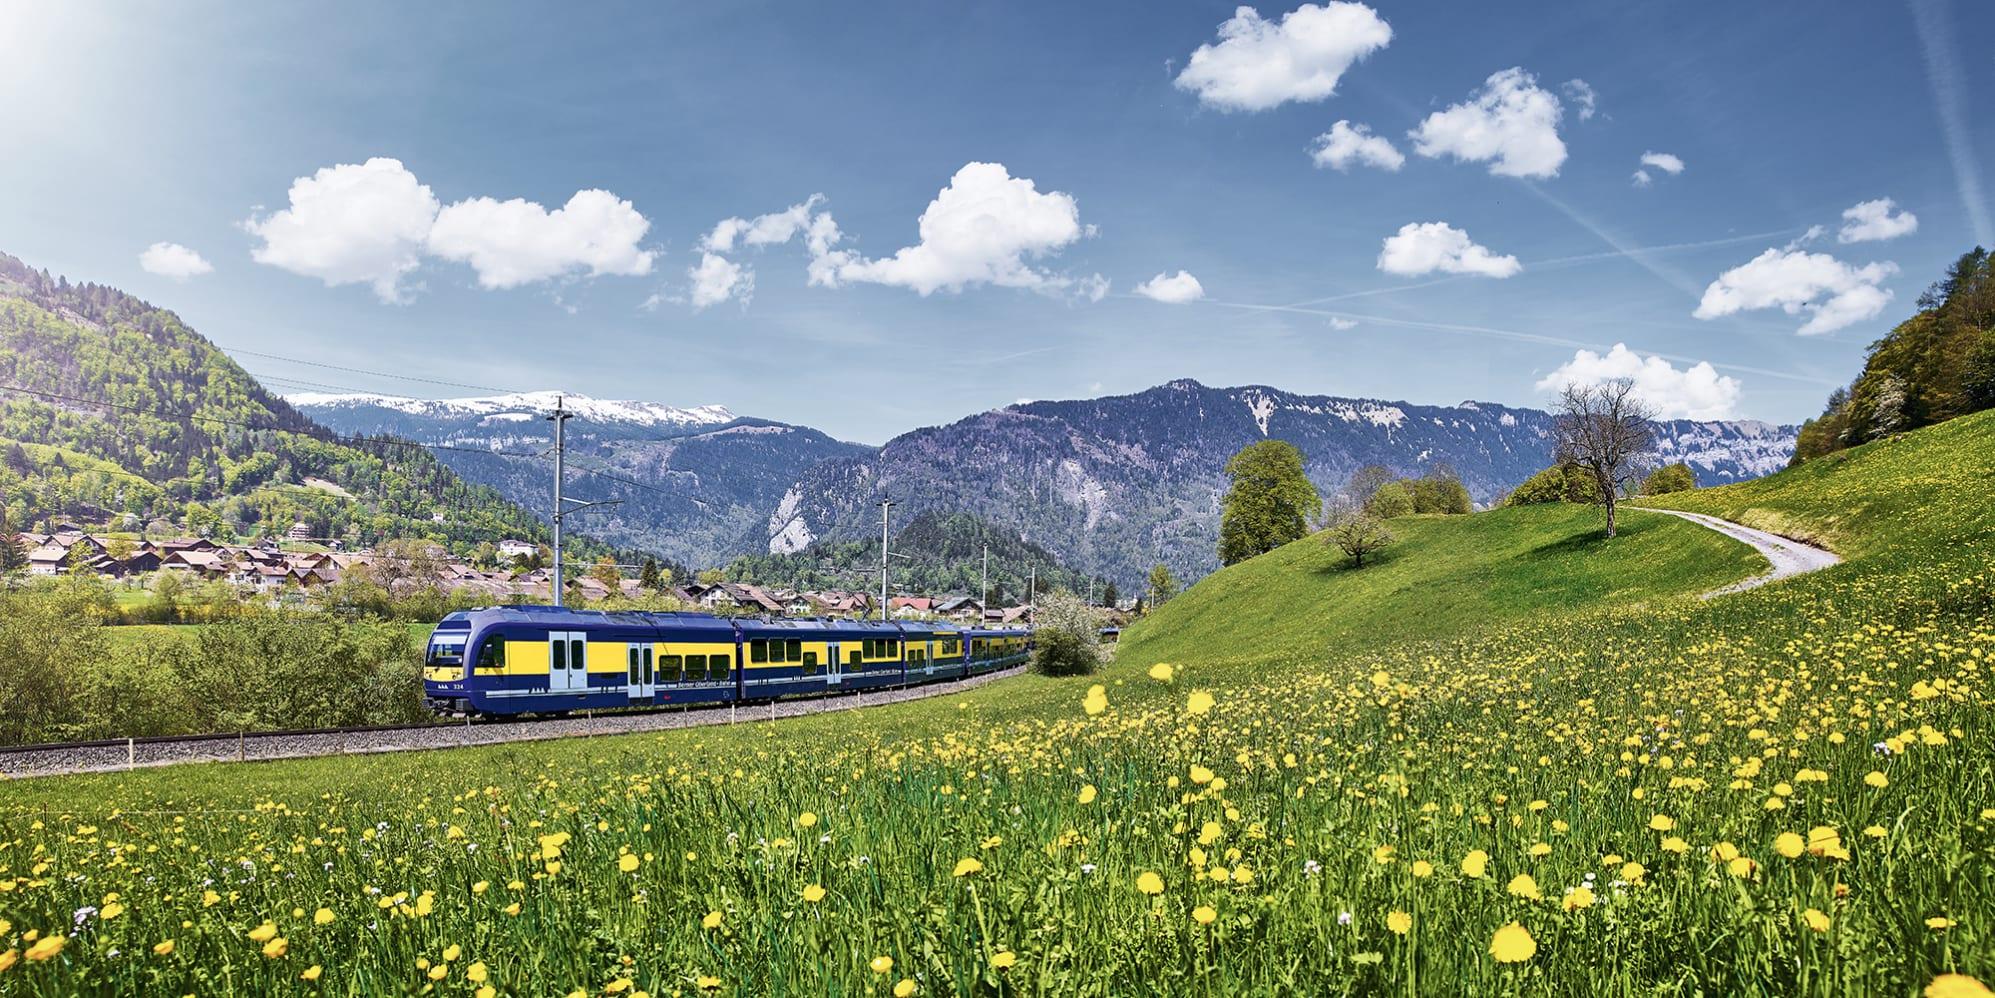 Bilddatenbank, Bilddatenbank-Berner-Oberland-Bahn, Bilddatenbank-Sommer, Bilddatenbank-Stichworte, Bilddatenbank-Themen